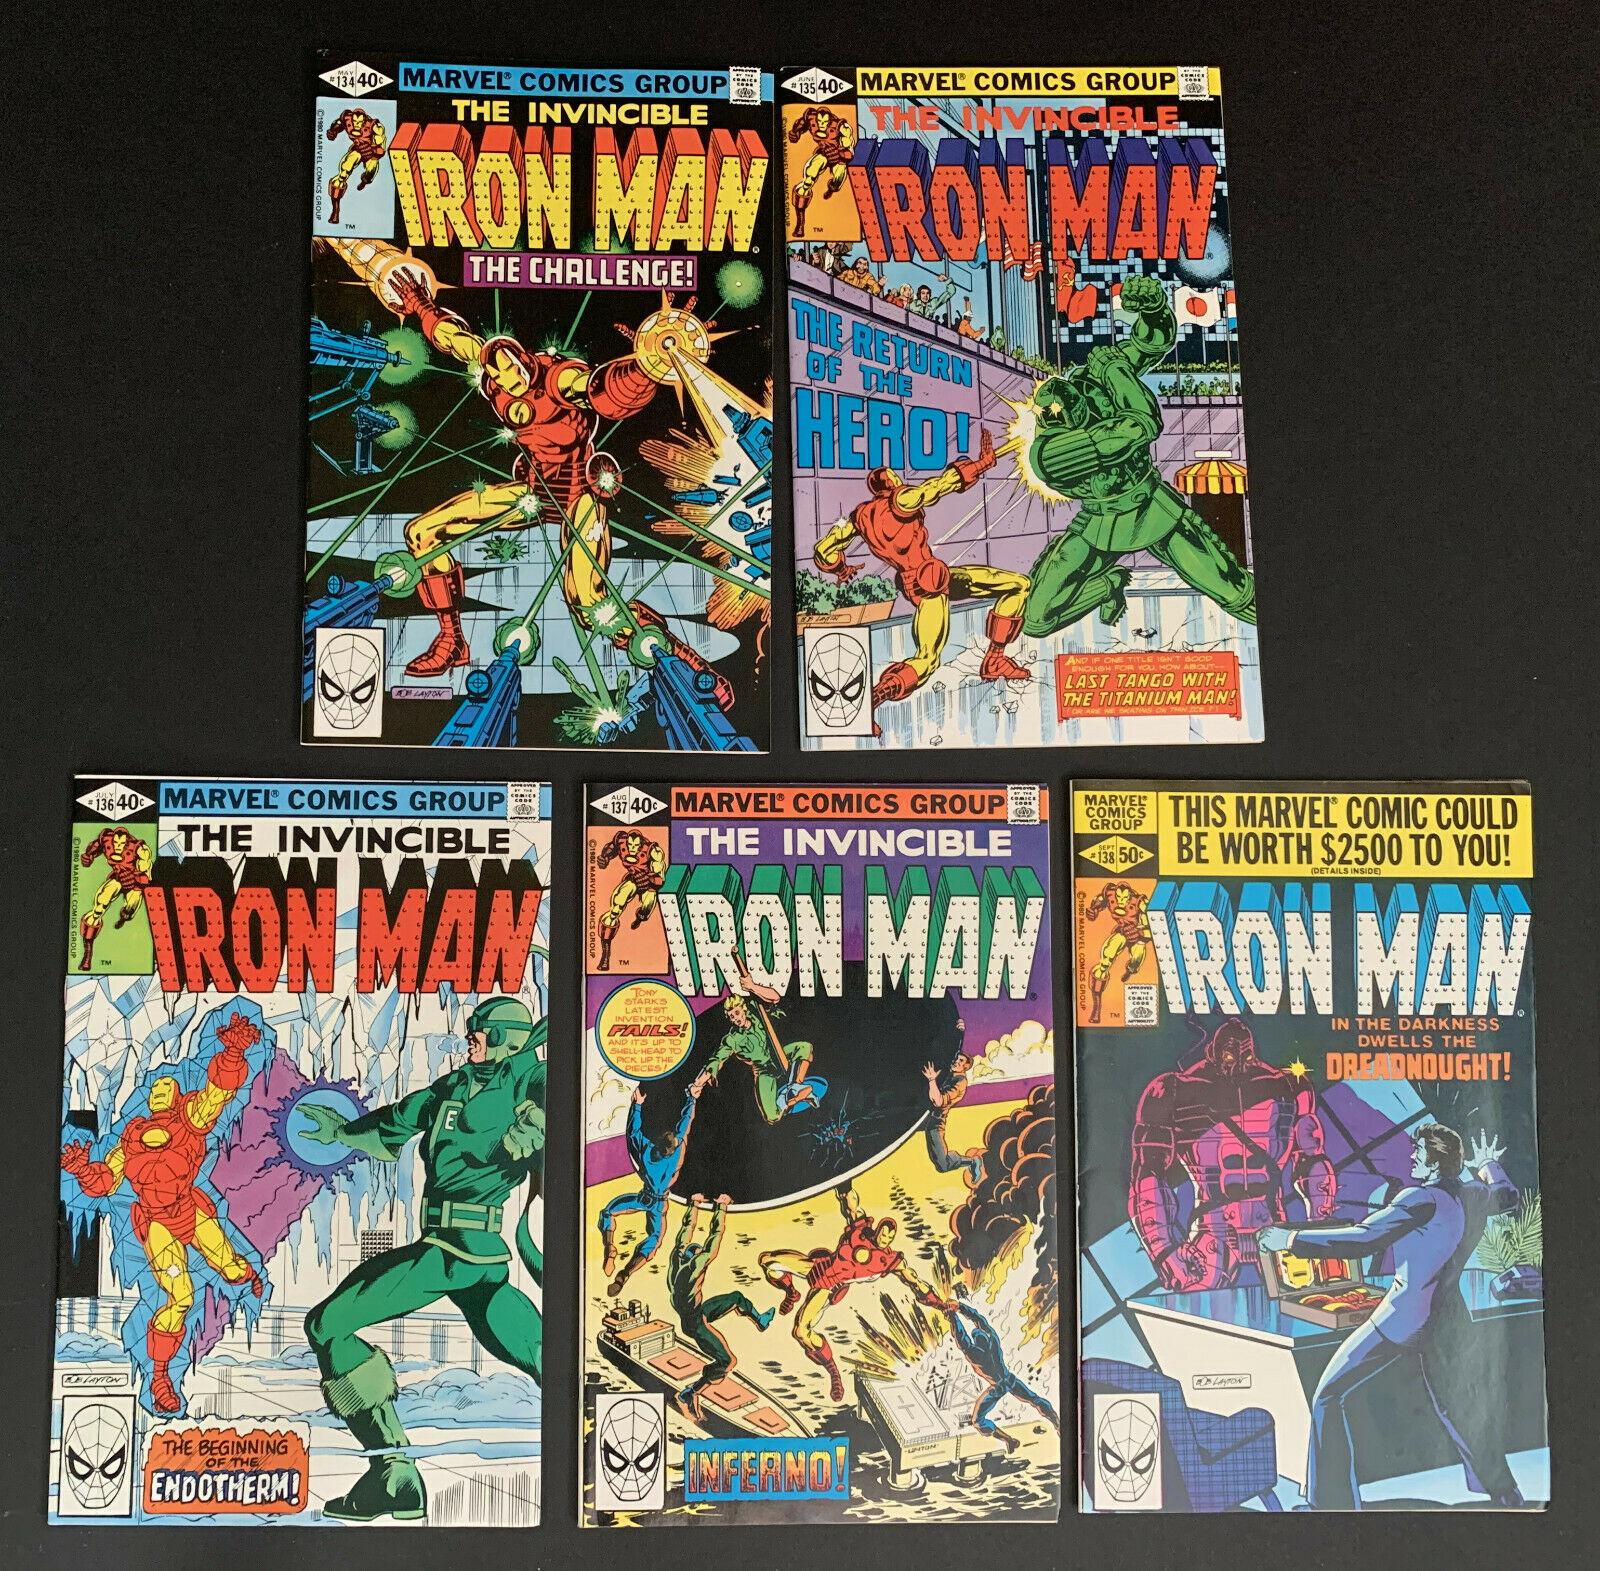 INVINCIBLE IRON MAN #134, 135, 136, 137 & 138 1ST ENDOTHERM MARVEL COMICS